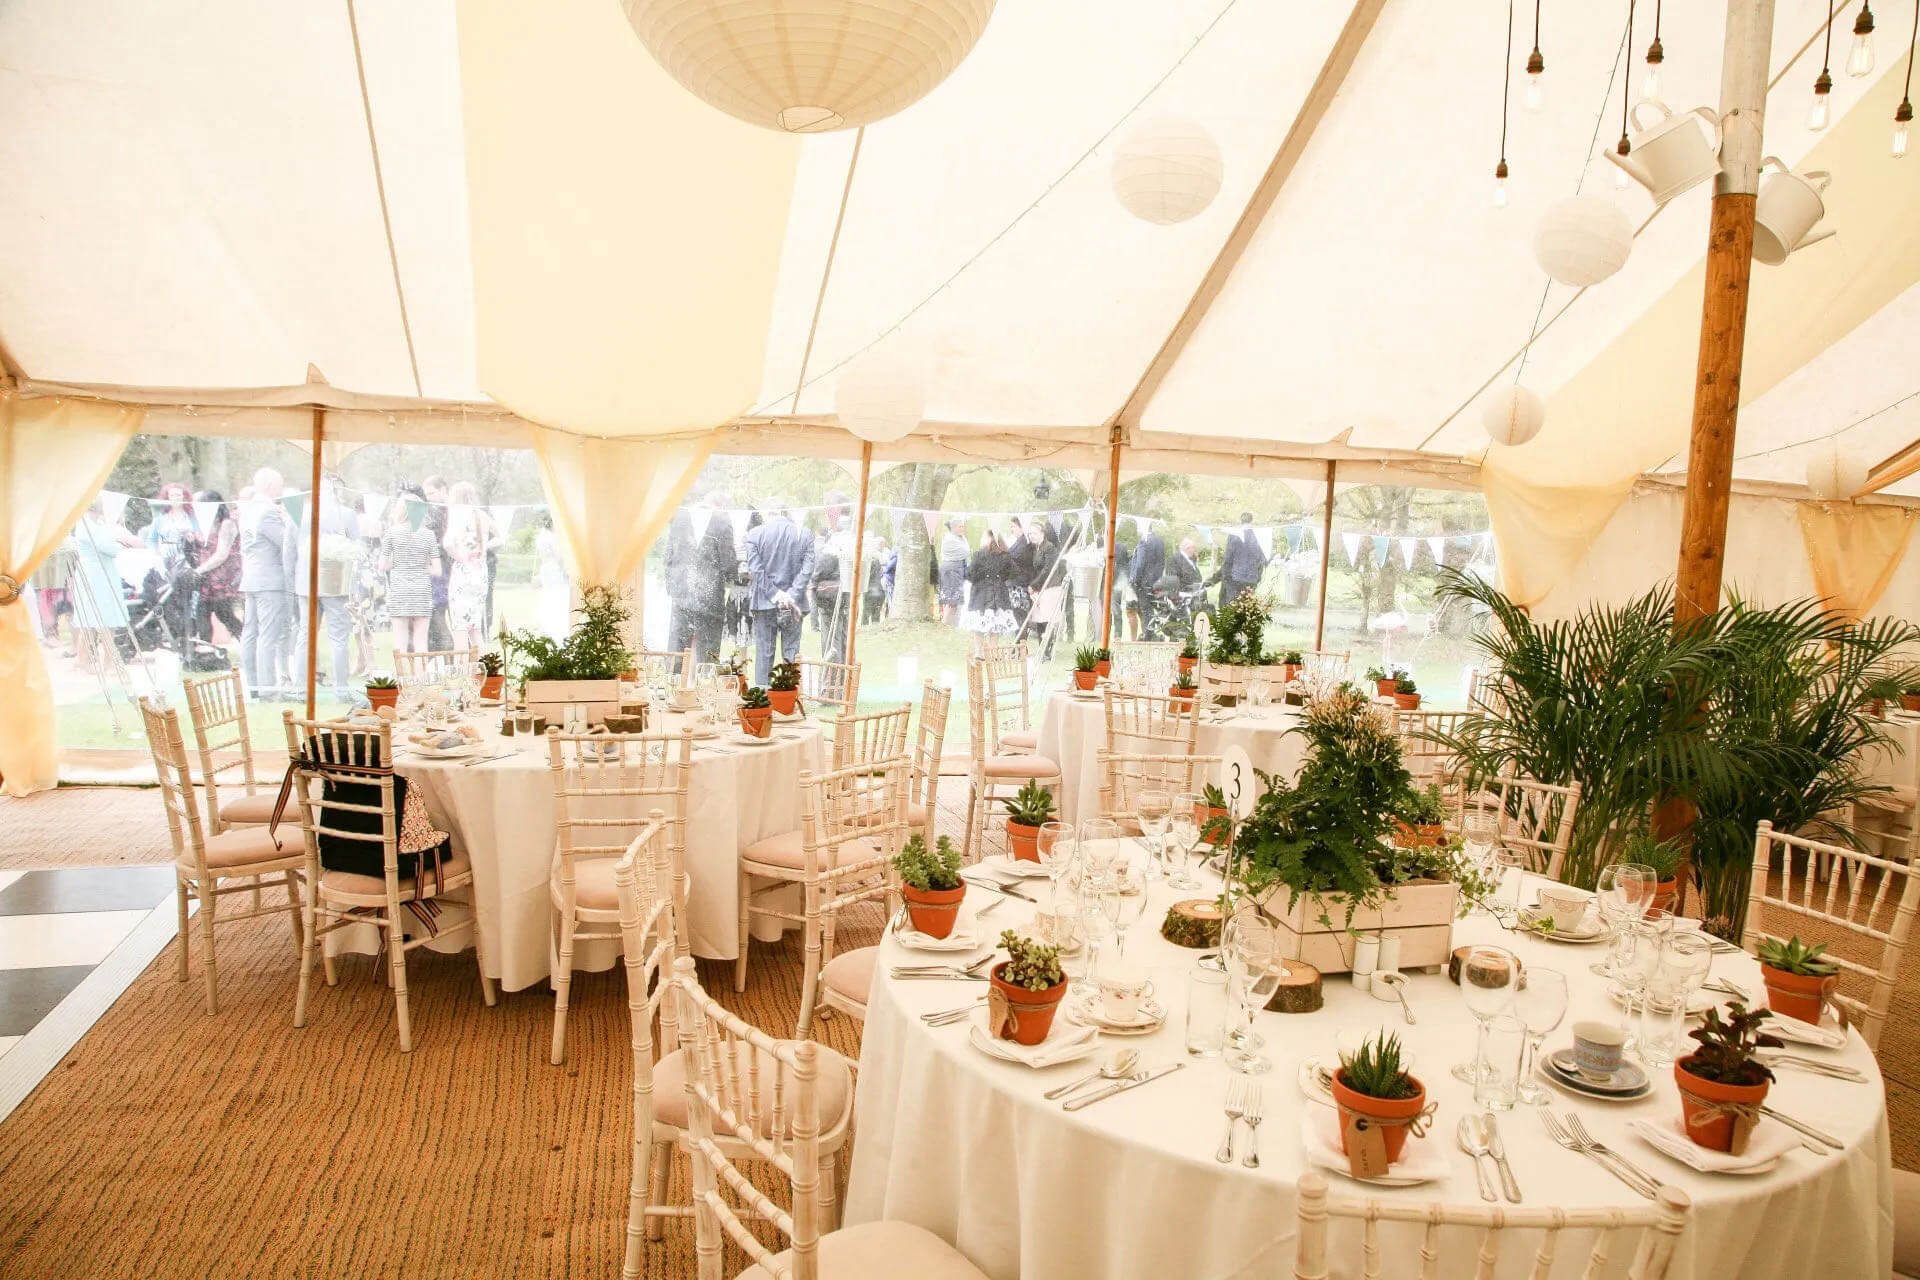 Inside Petal marquee wedding tent ©cotswoldweddings